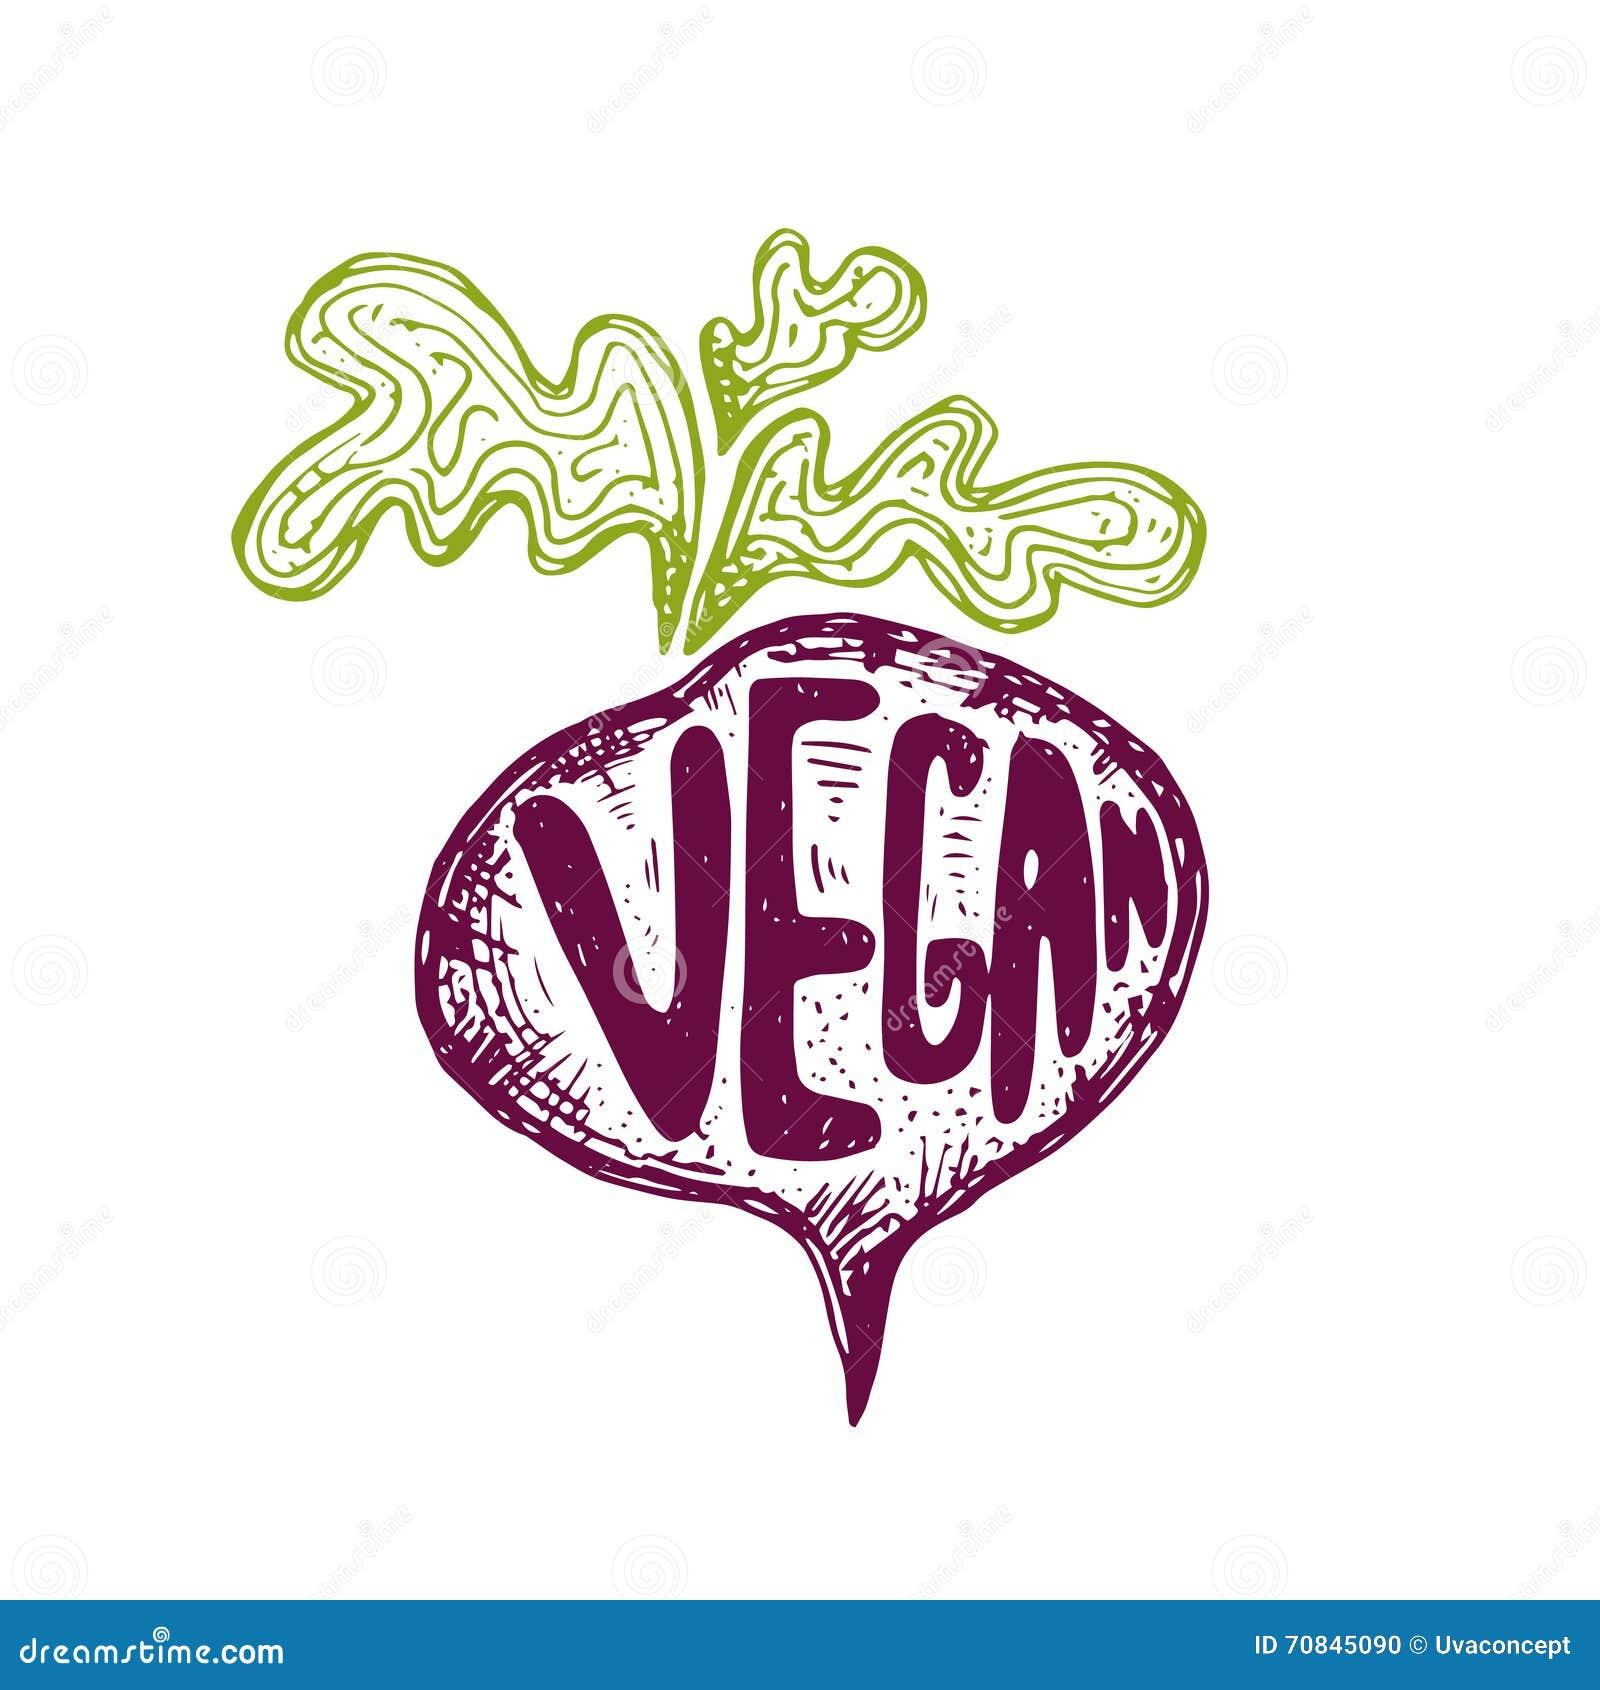 Illustration of hand drawn beetroot text vegan. Vector